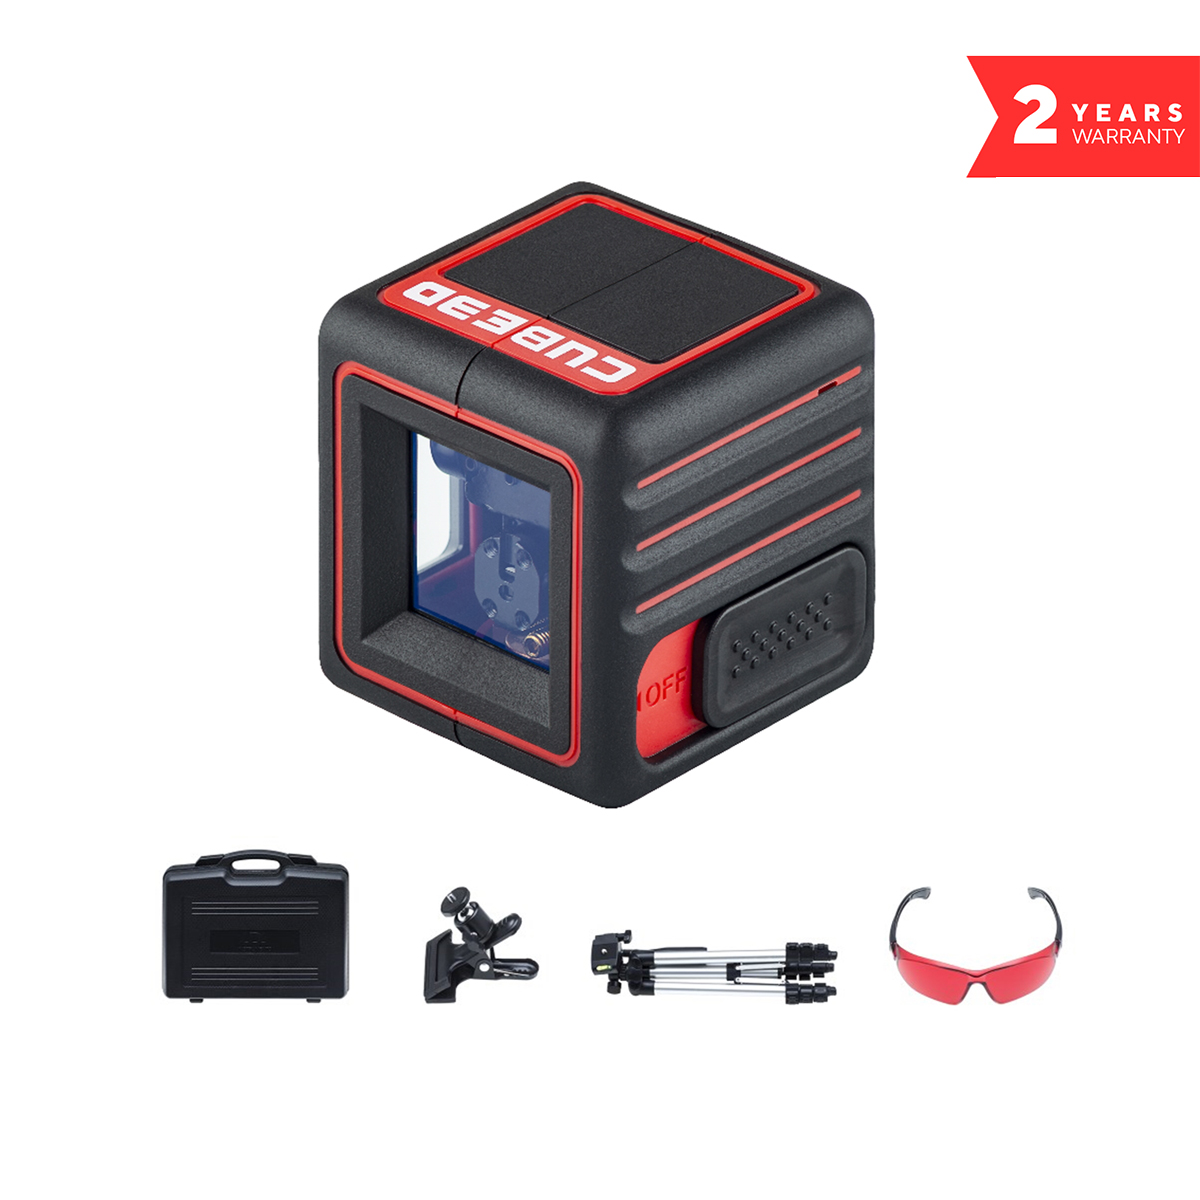 Laser level ADA CUBE 3D ULTIMATE EDITION